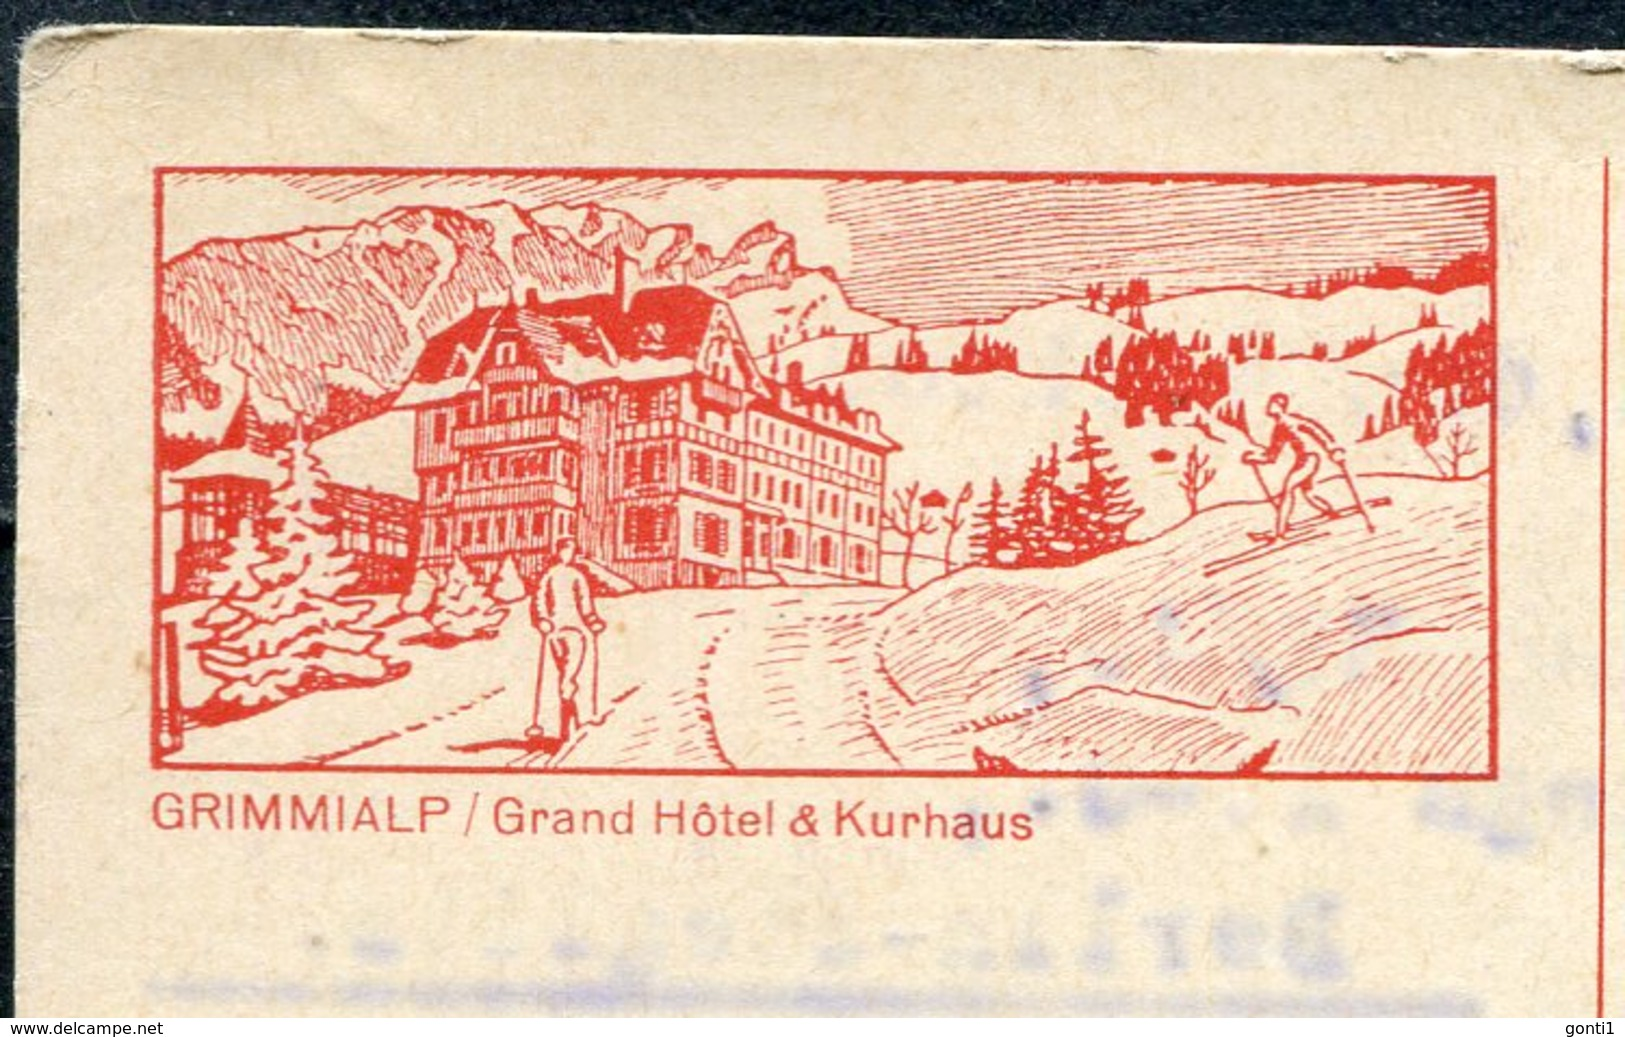 "Schweiz 1927 Bildpostkarte Mi.Nr.P????-20er,rot"" Grimmialp,Kurhaus"" Befördert ""Zürich-Berlin,Germany  ""1 GS Used - Interi Postali"